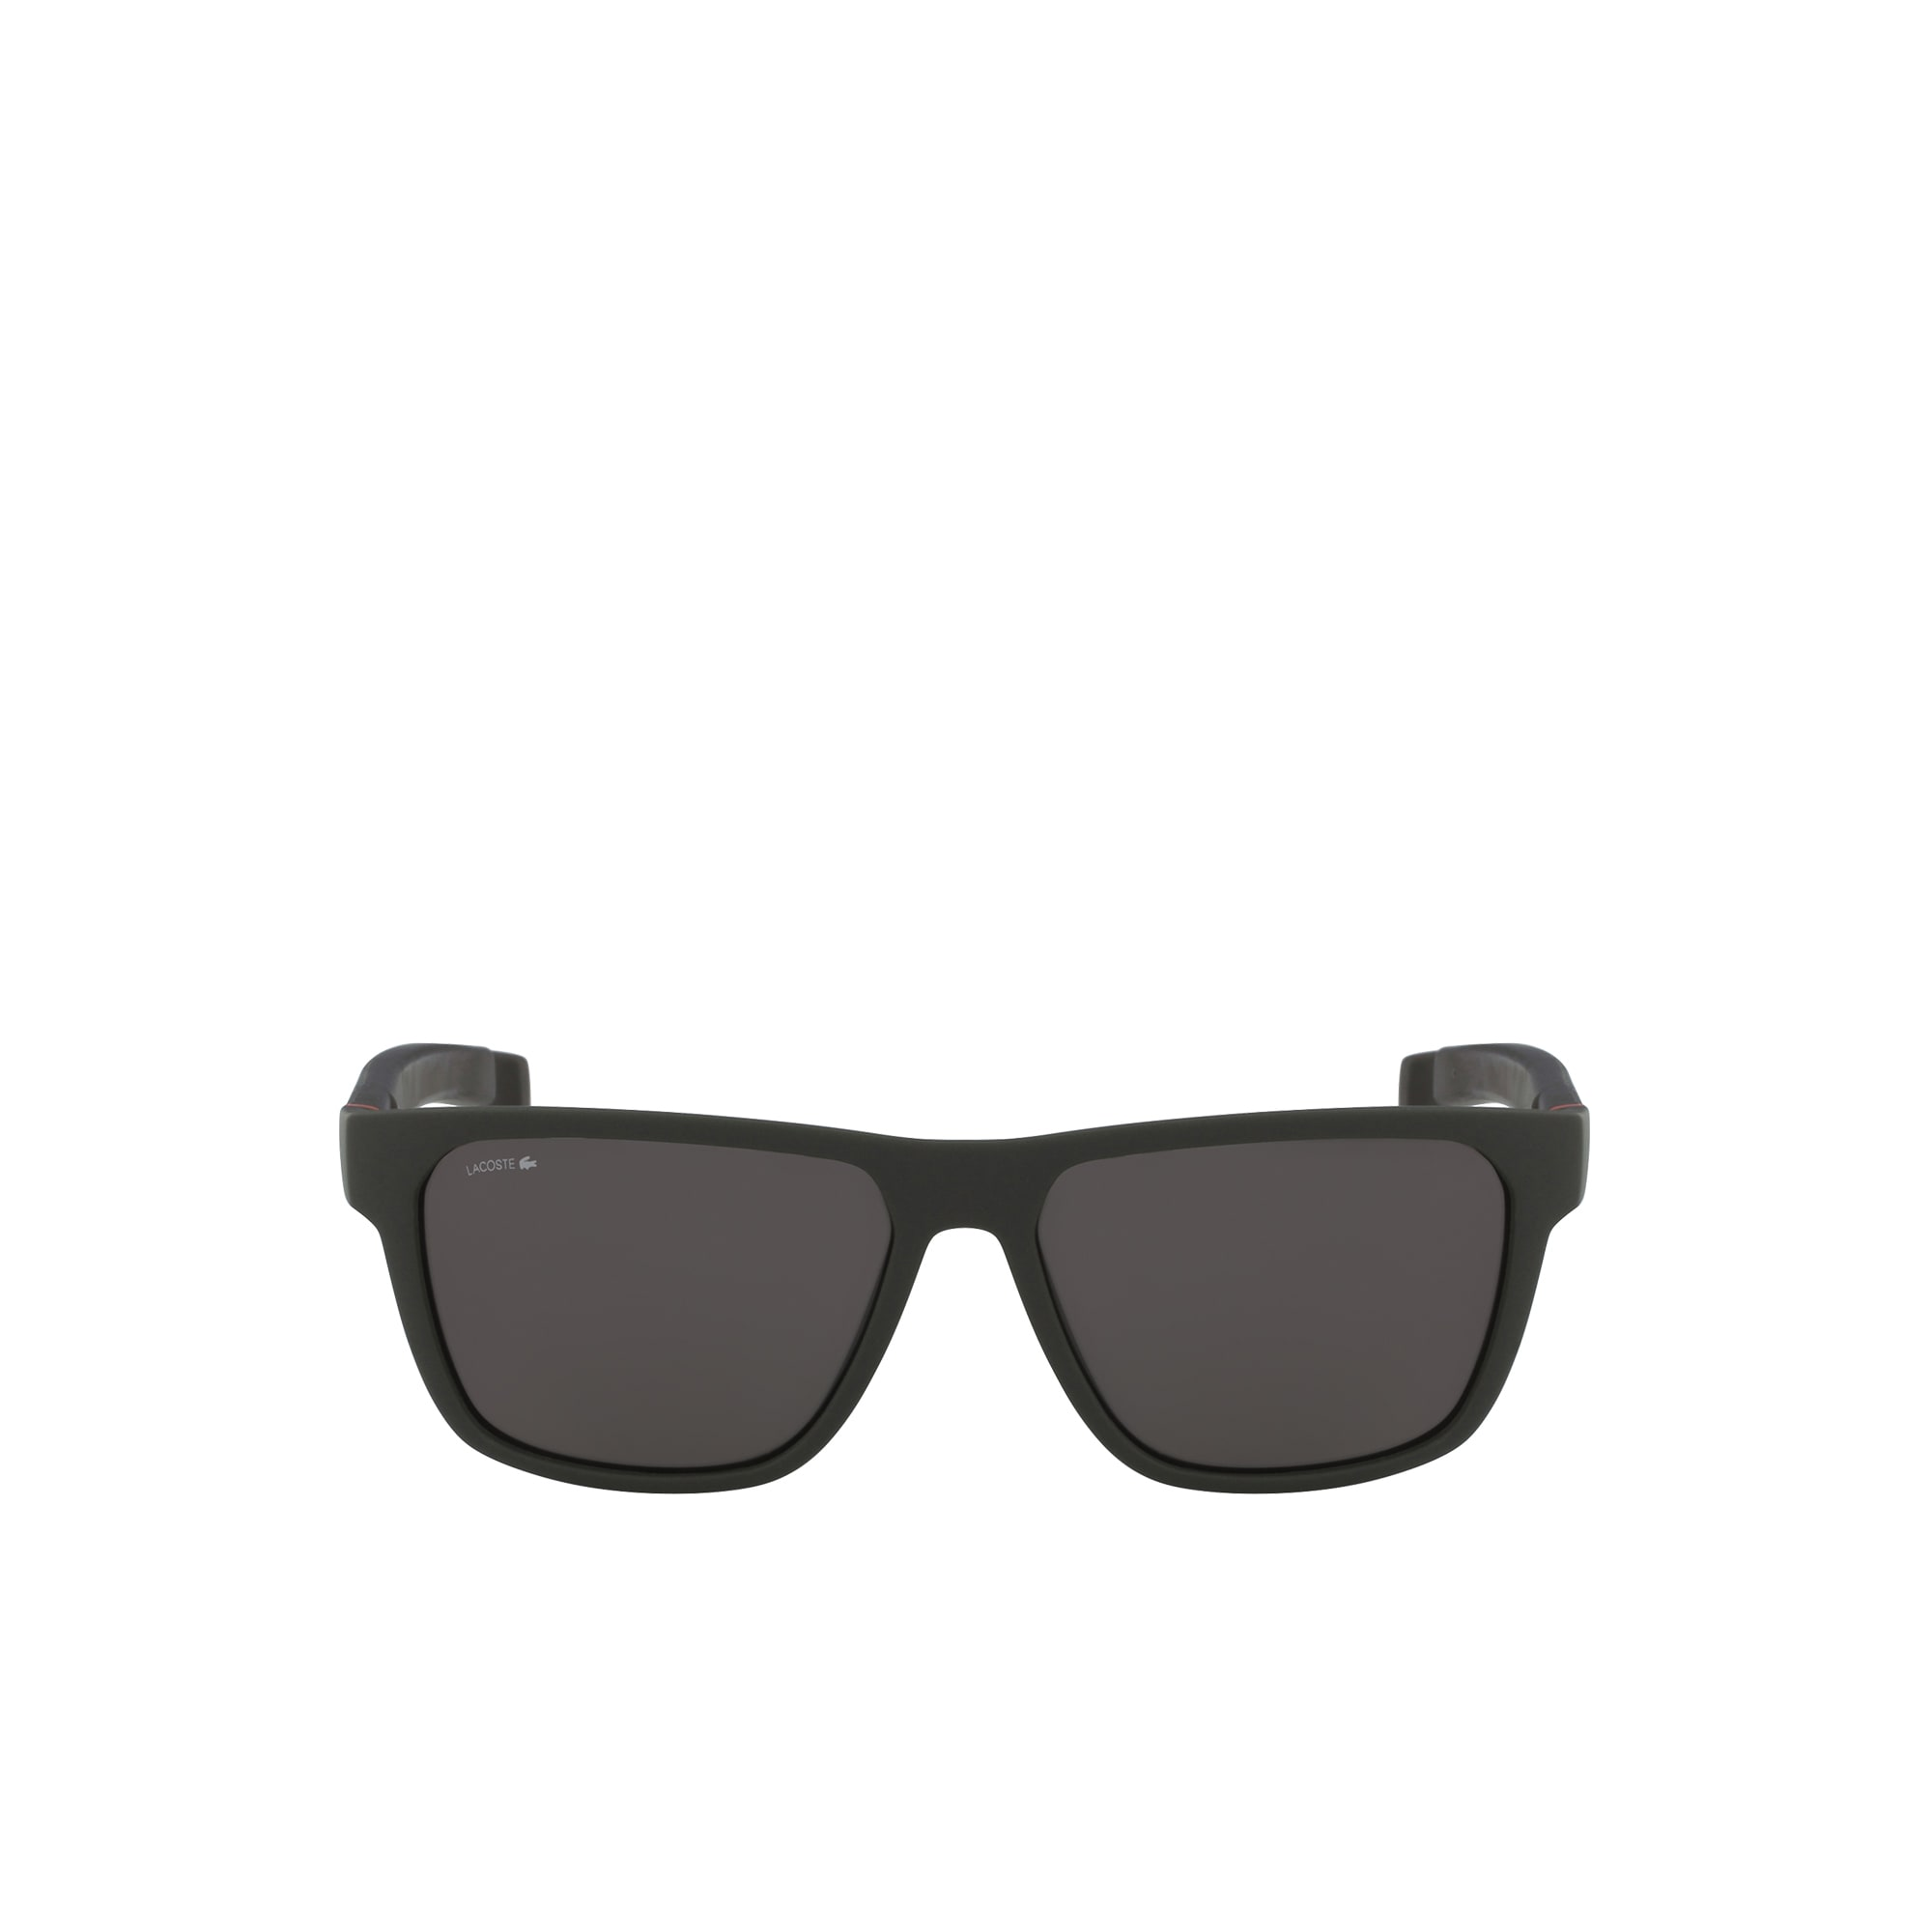 Plastic Magnetic Frames Sunglasses